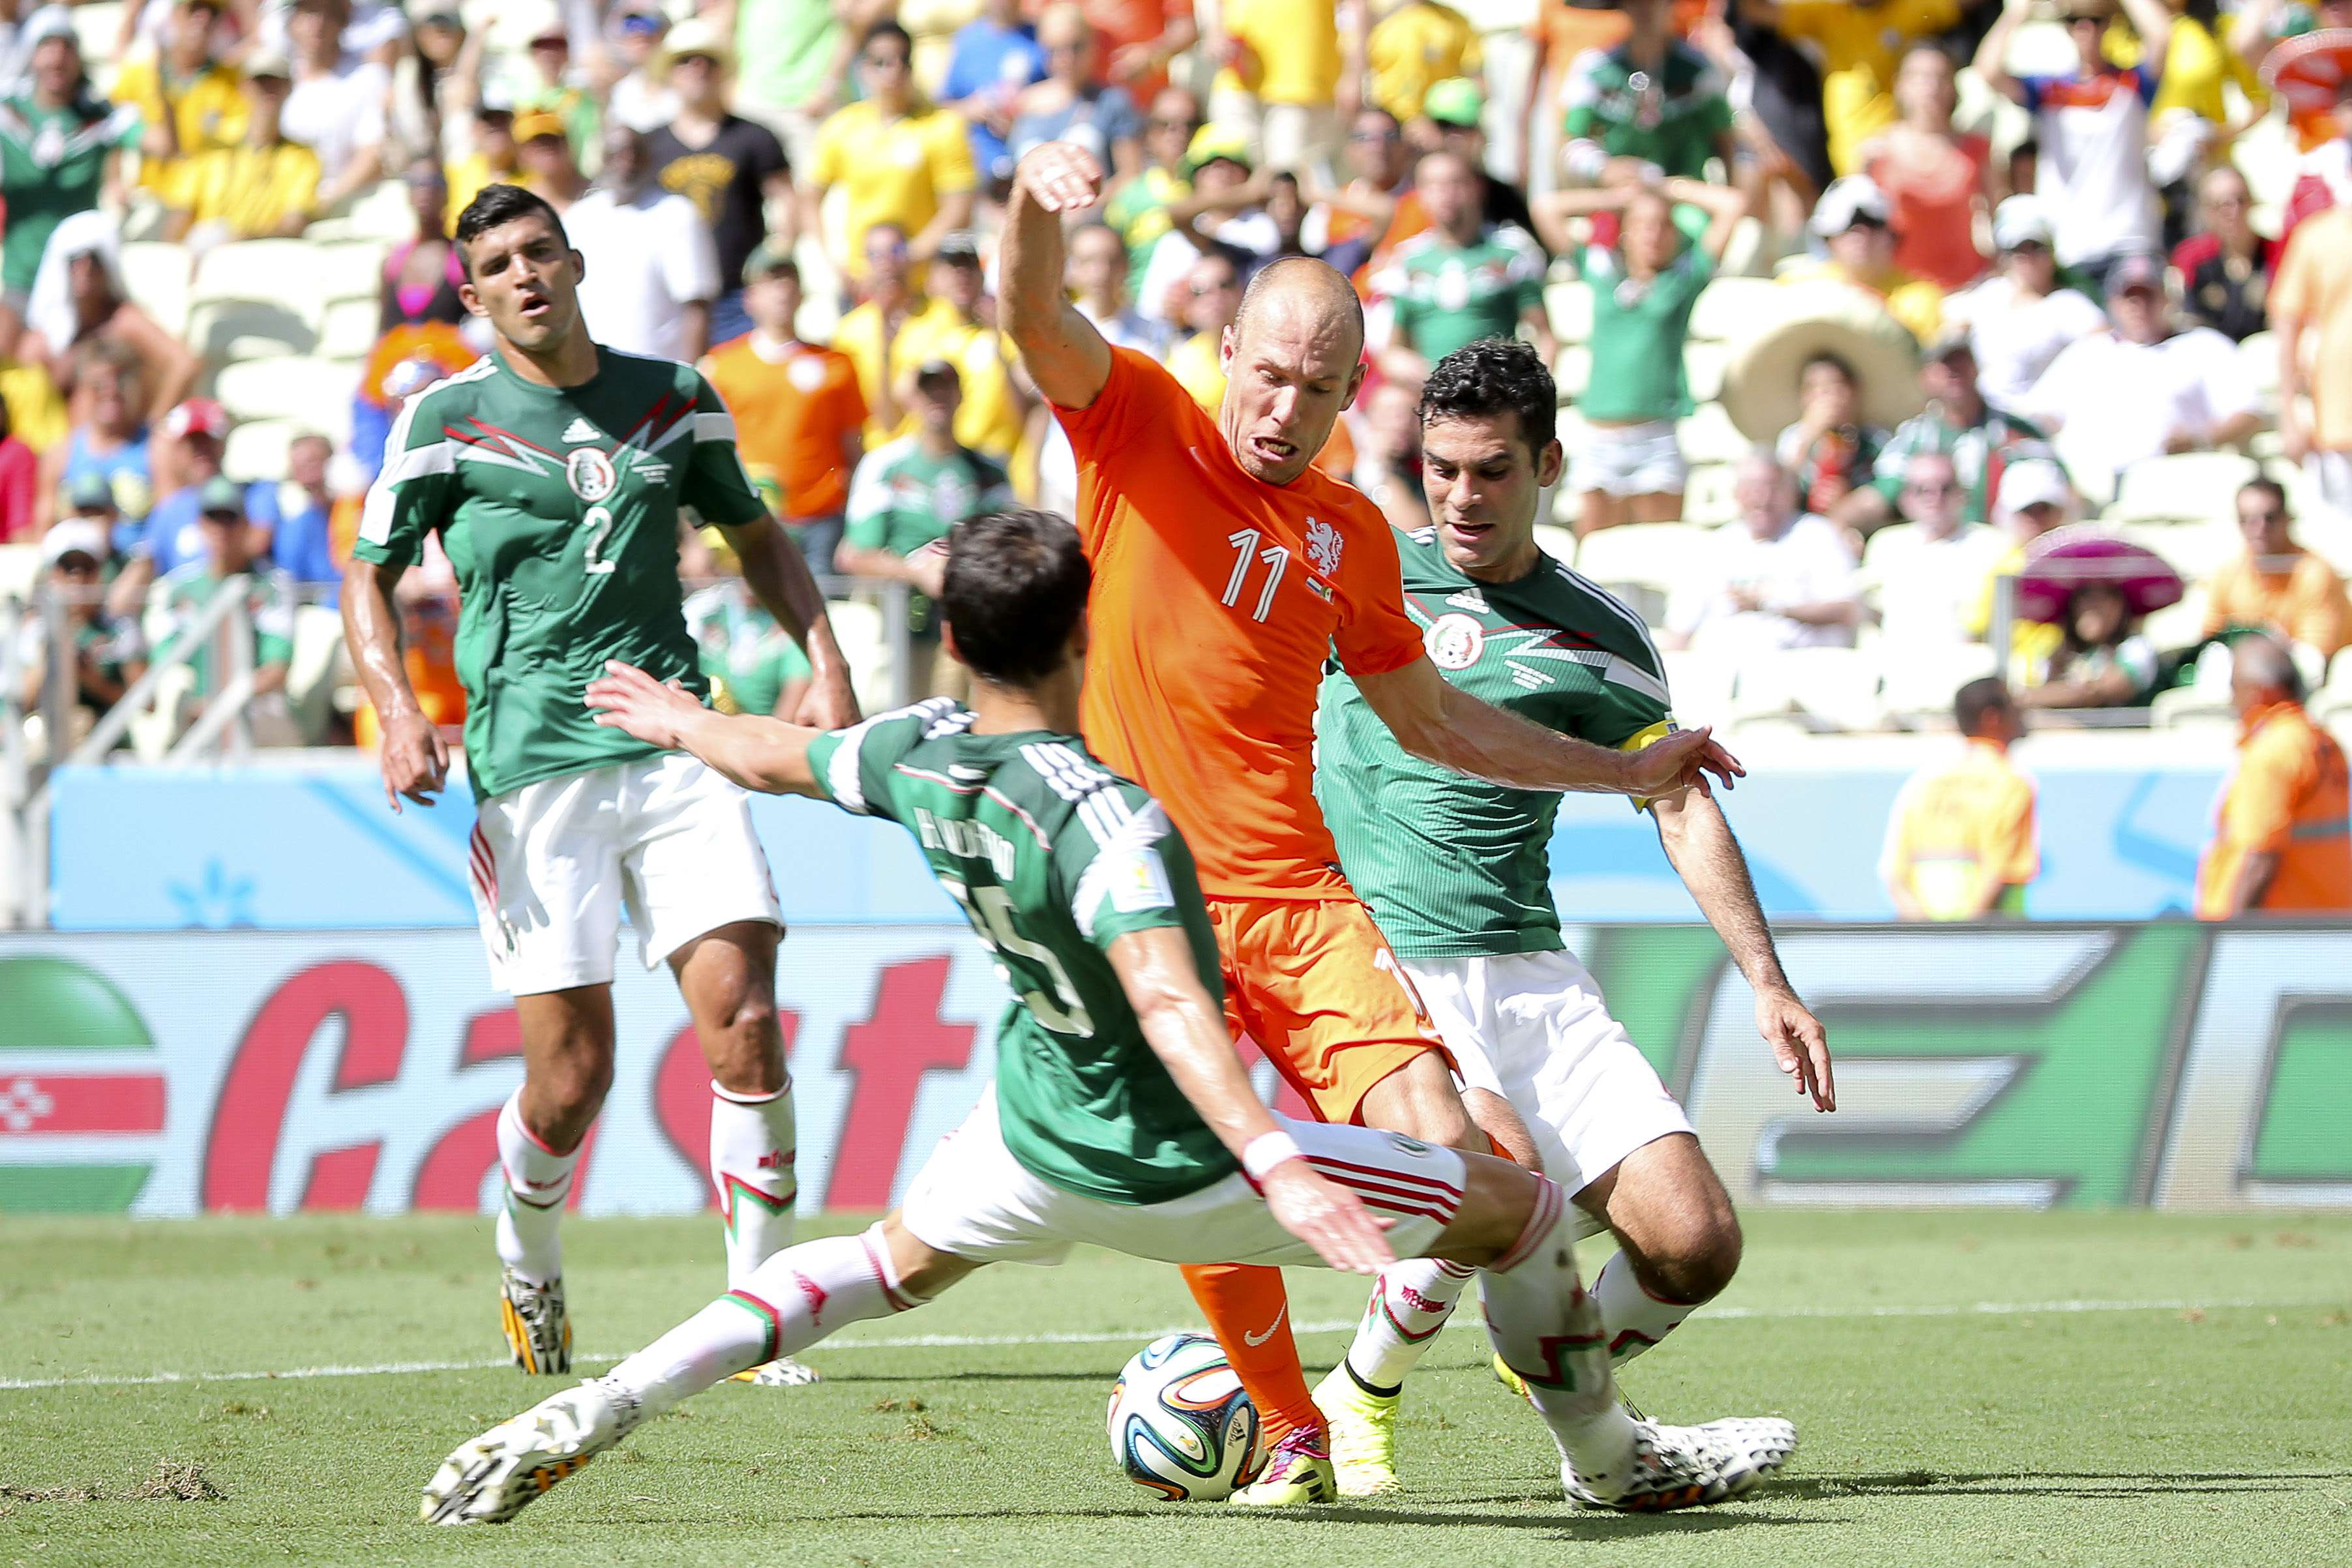 Mexico tendria revancha contra holanda en amsterdam mundial 2014